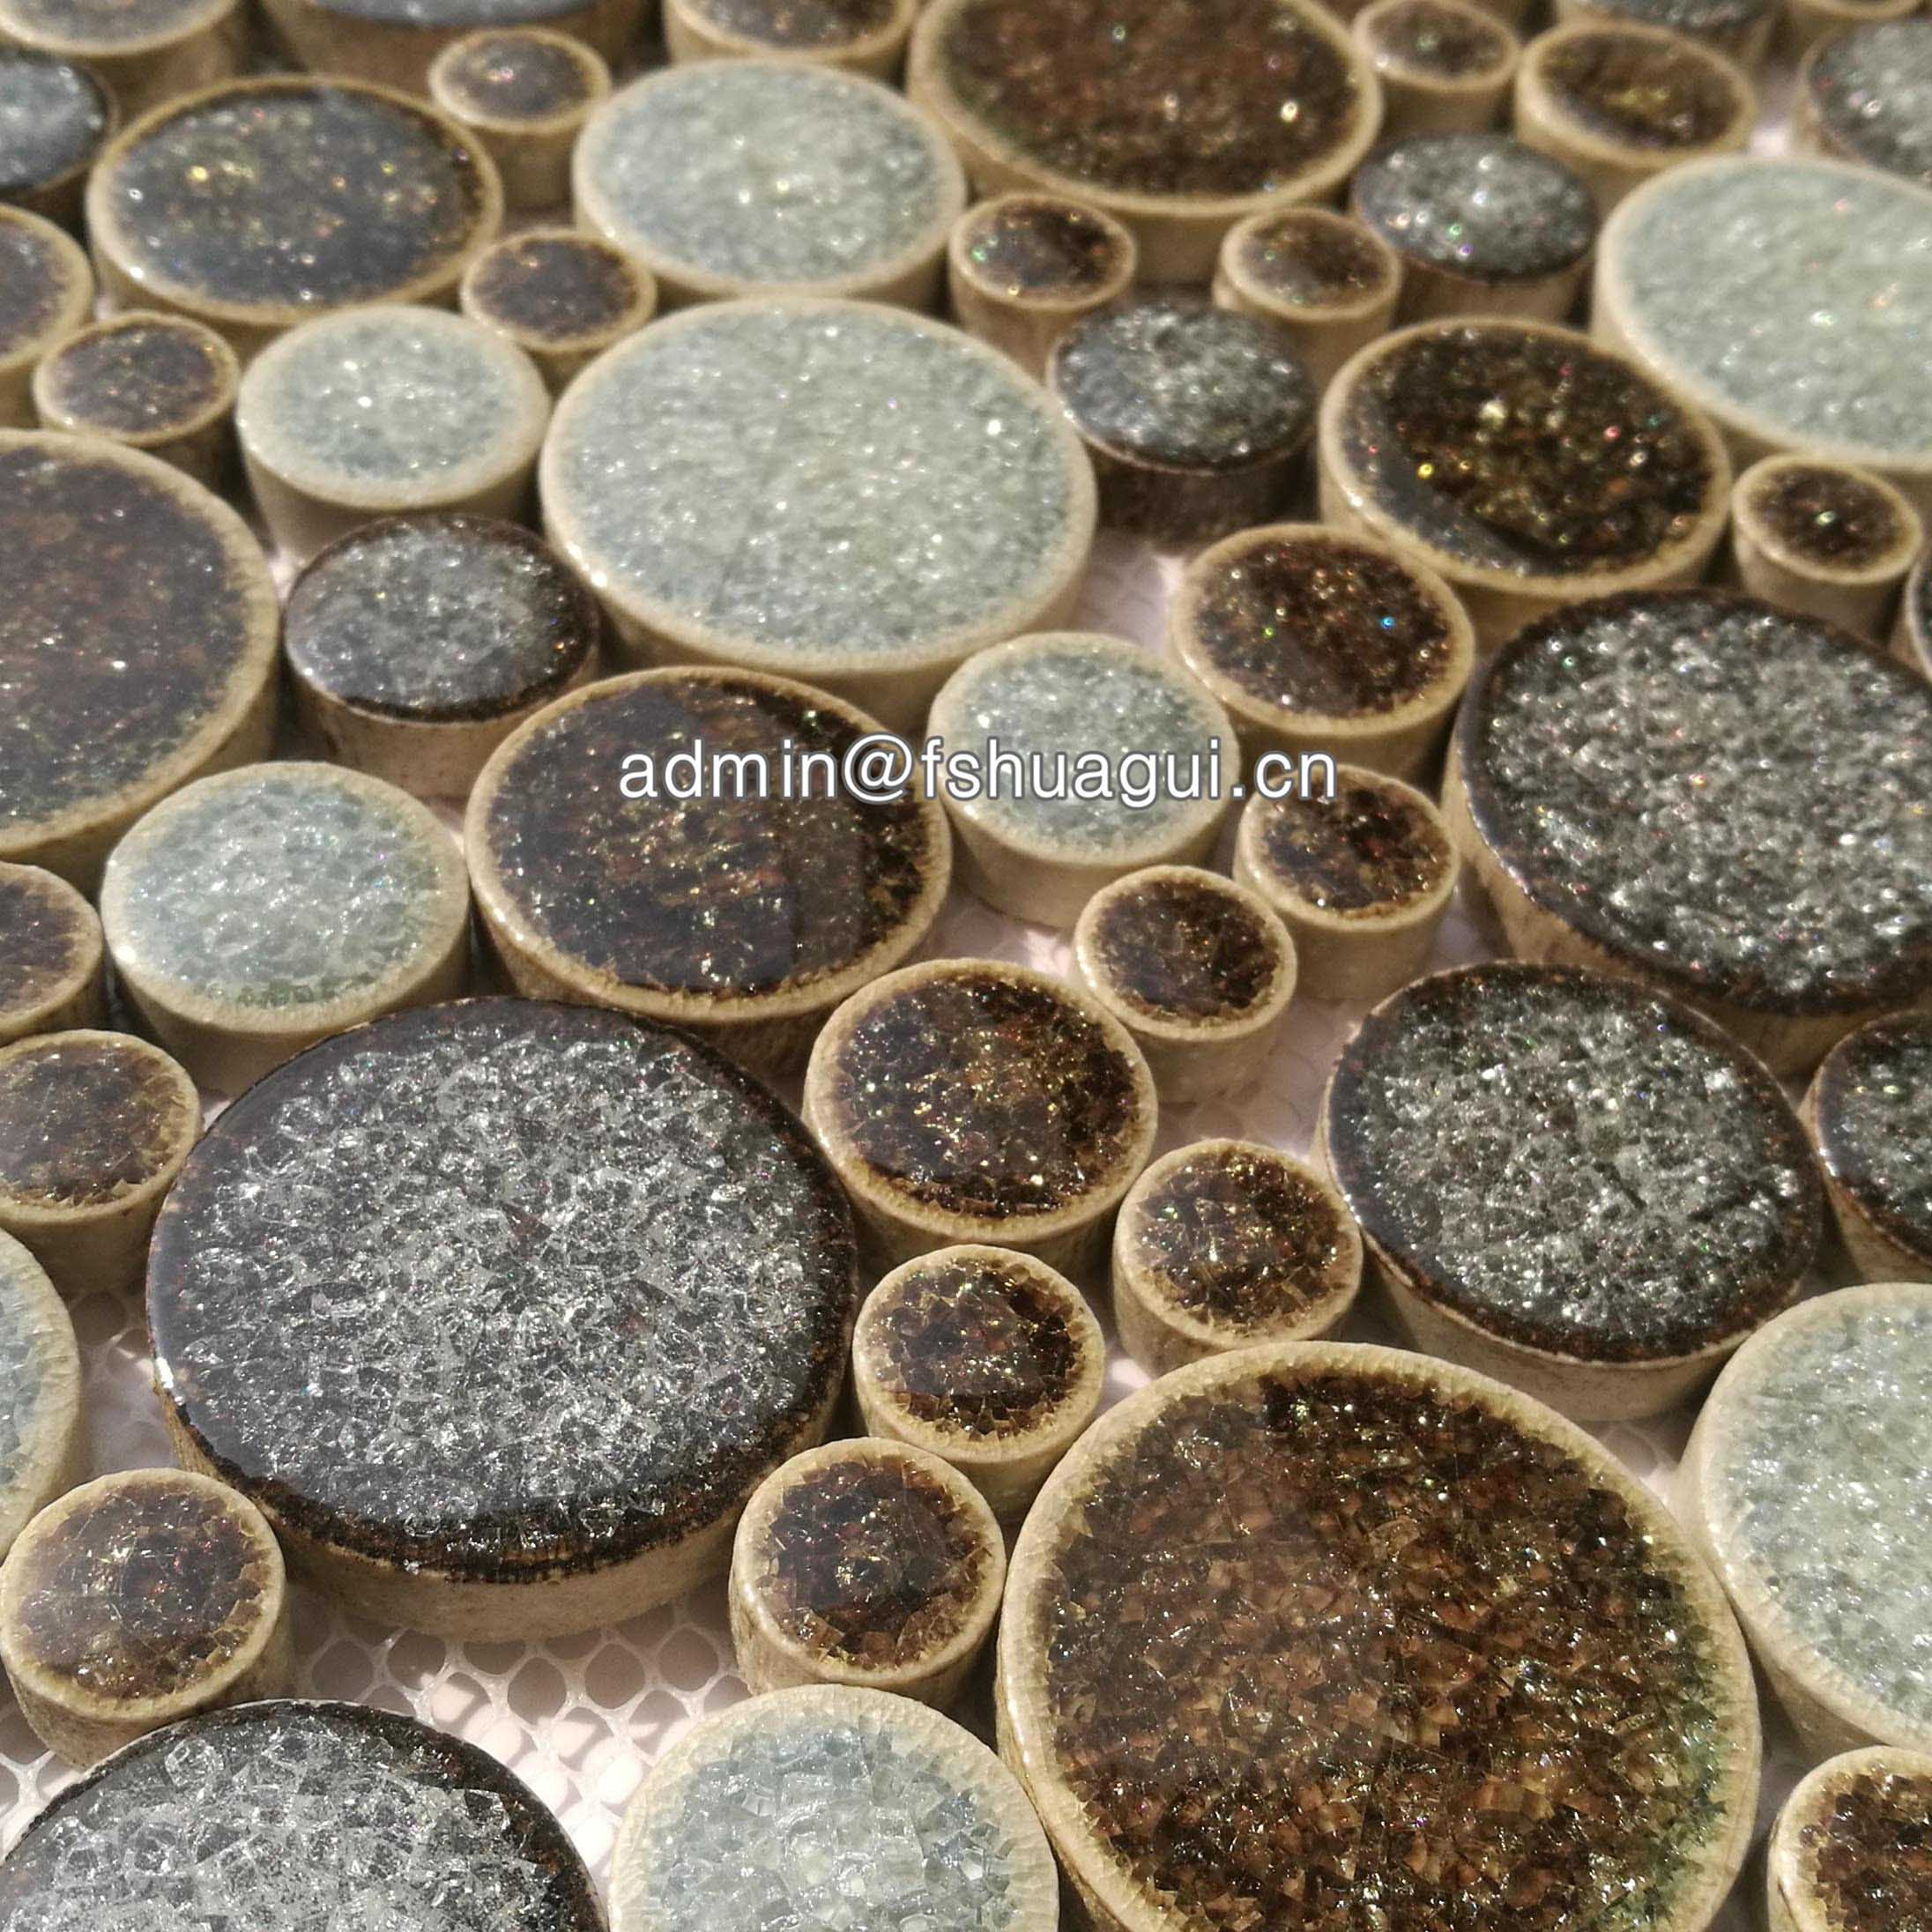 Huagui Ceramic mosaic tile HG-IC003 CERAMIC MOSAIC TILE image12